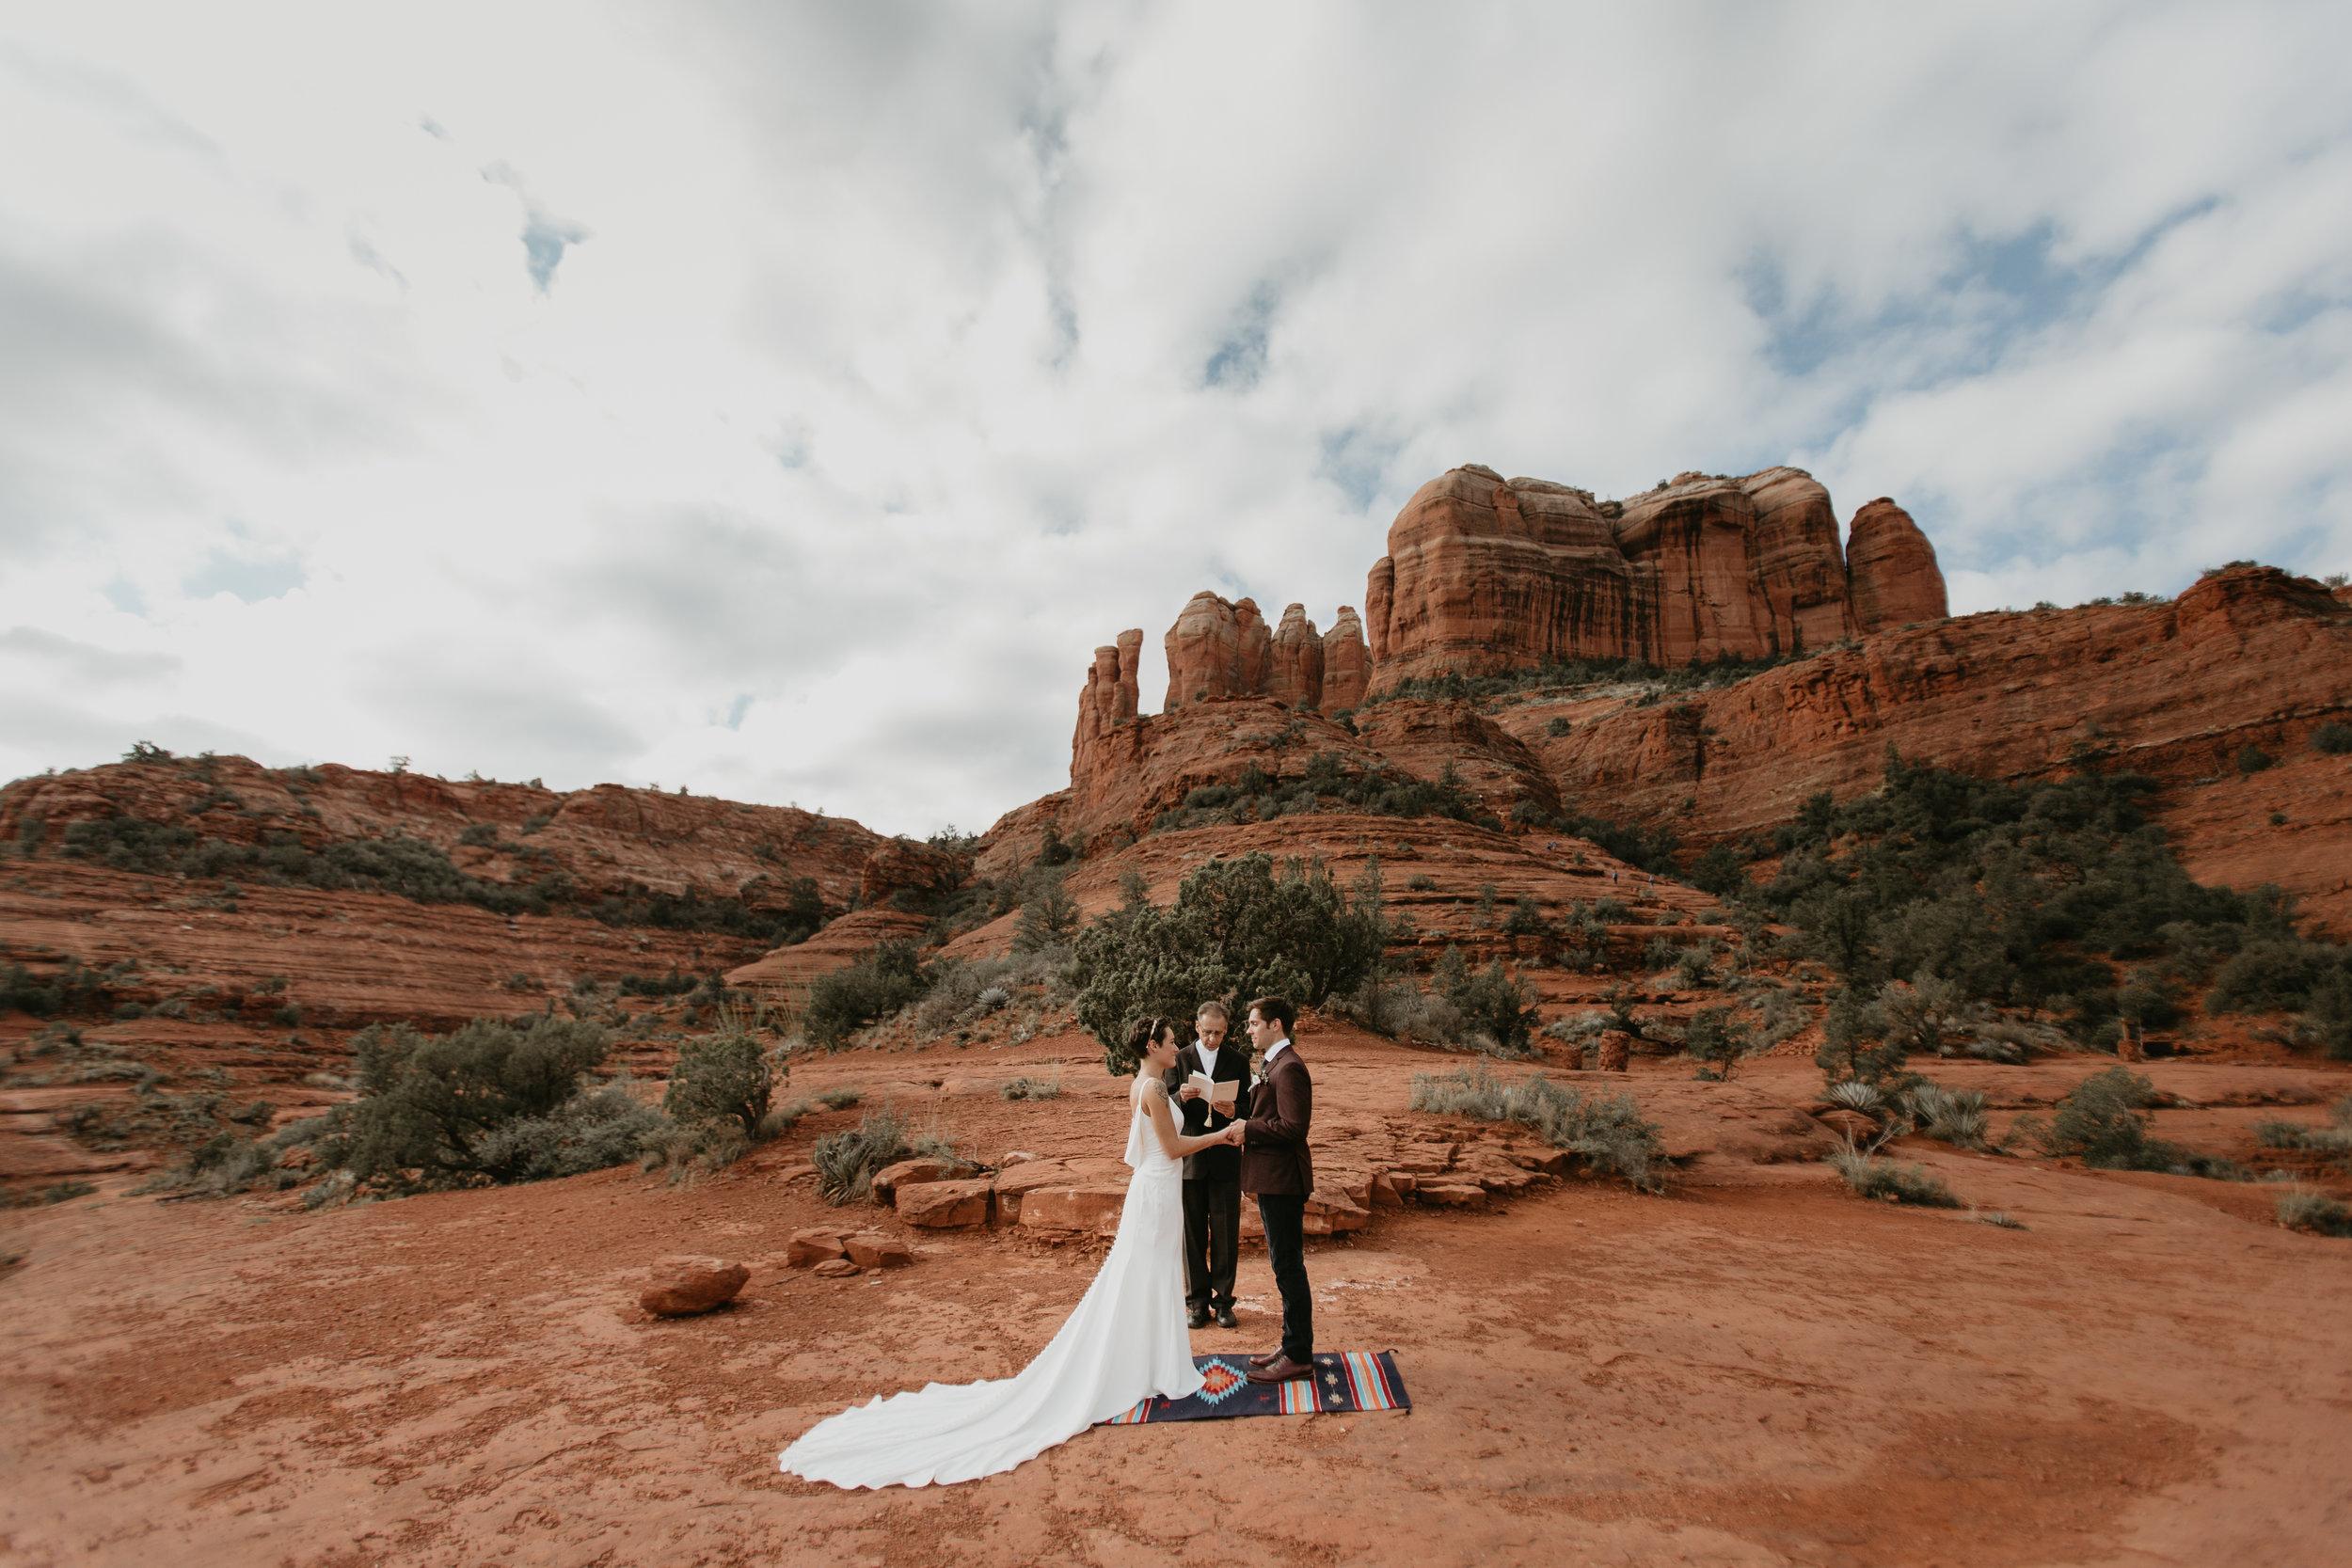 nicole-daacke-photography-sedona-arizona-destination-elopement-wedding-photographer-catherdral-rock-hiking-elopement-sedona-river-elopement-photos-desert-rock-wedding-photographer-laid-back-spontaneous-elopement-81.jpg